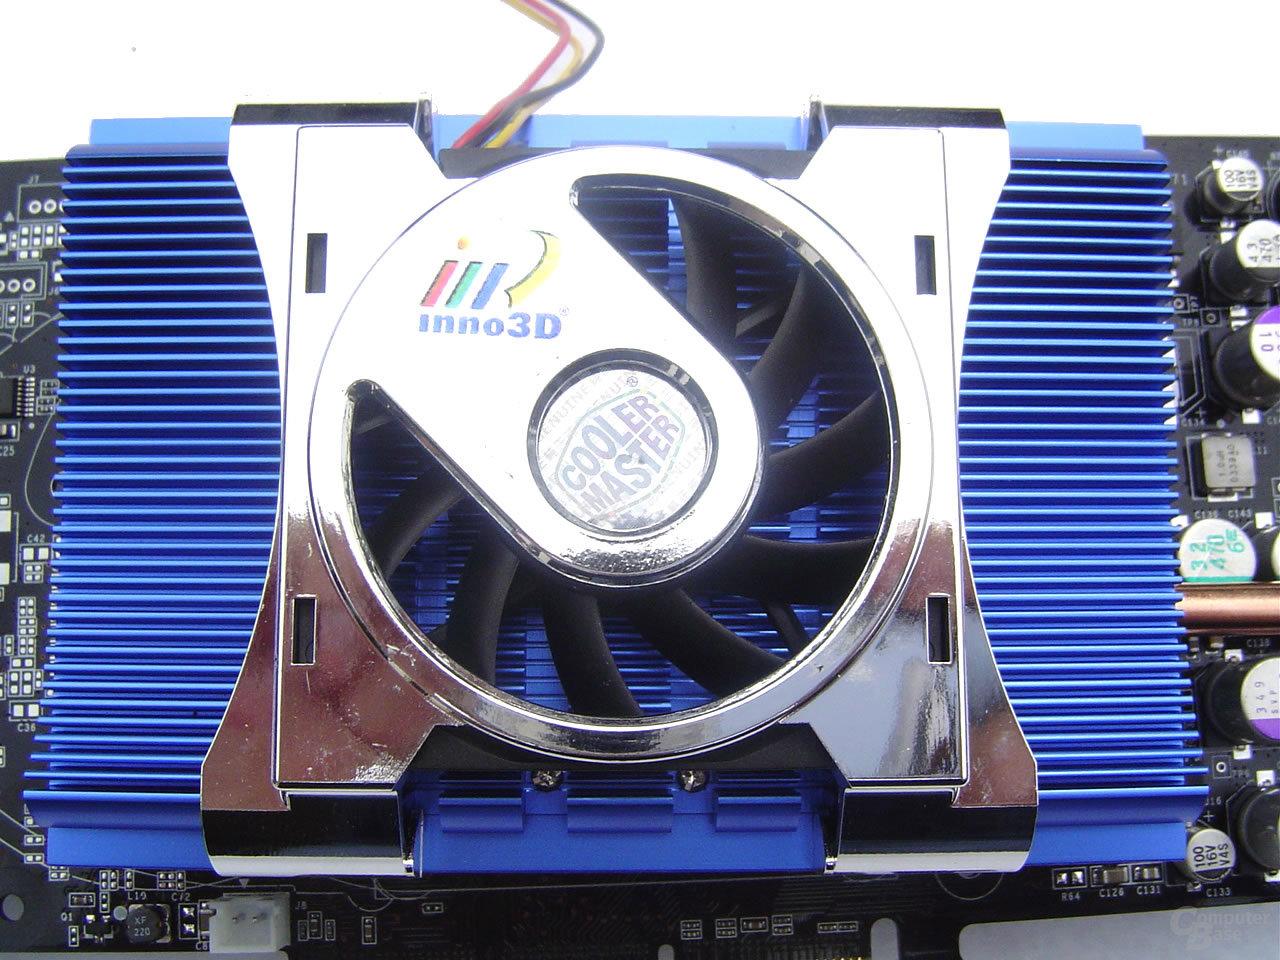 Inno3D GeForce 6800 Cool Viva